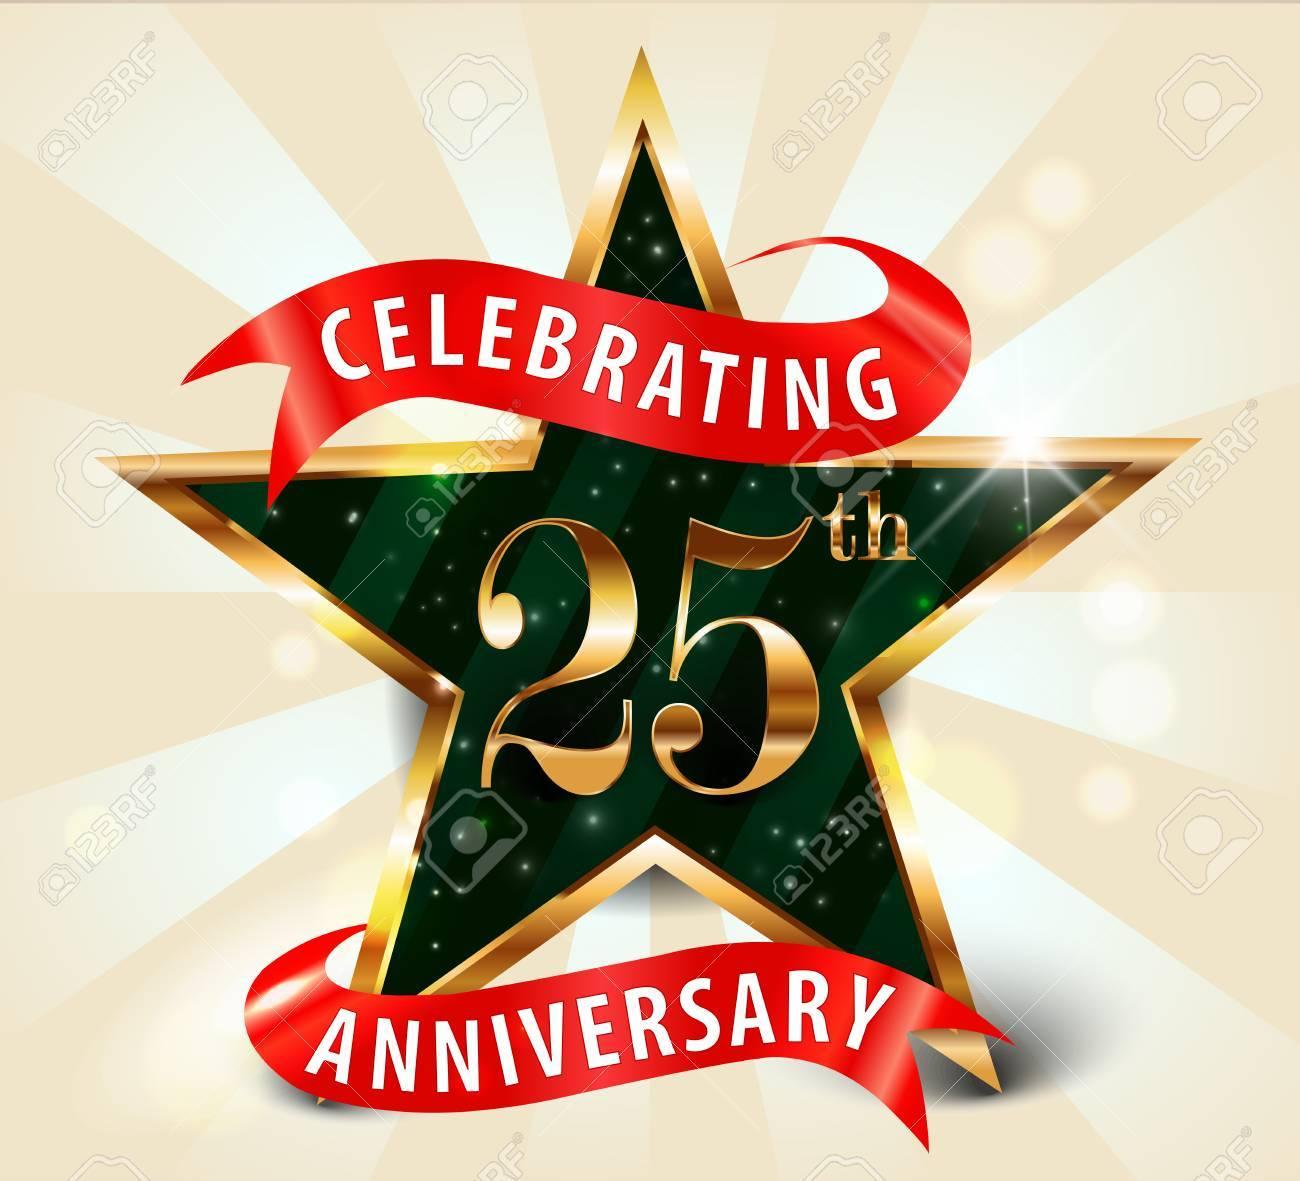 25 Year Anniversary Celebration Golden Star Ribbon, Celebrating ...